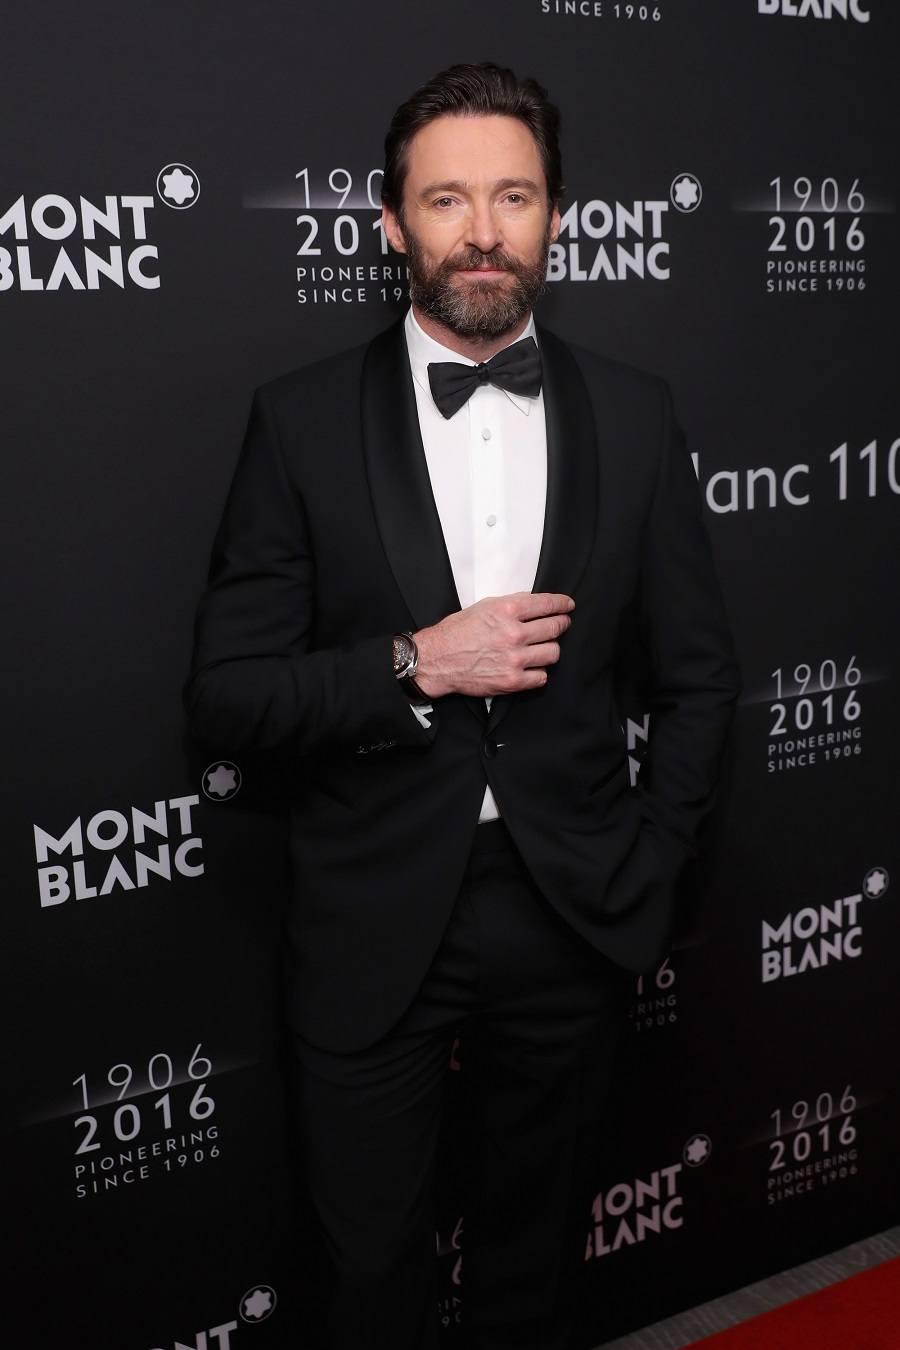 Hugh Jackman attends the Montblanc 110 Year Anniversary Gala Dinner